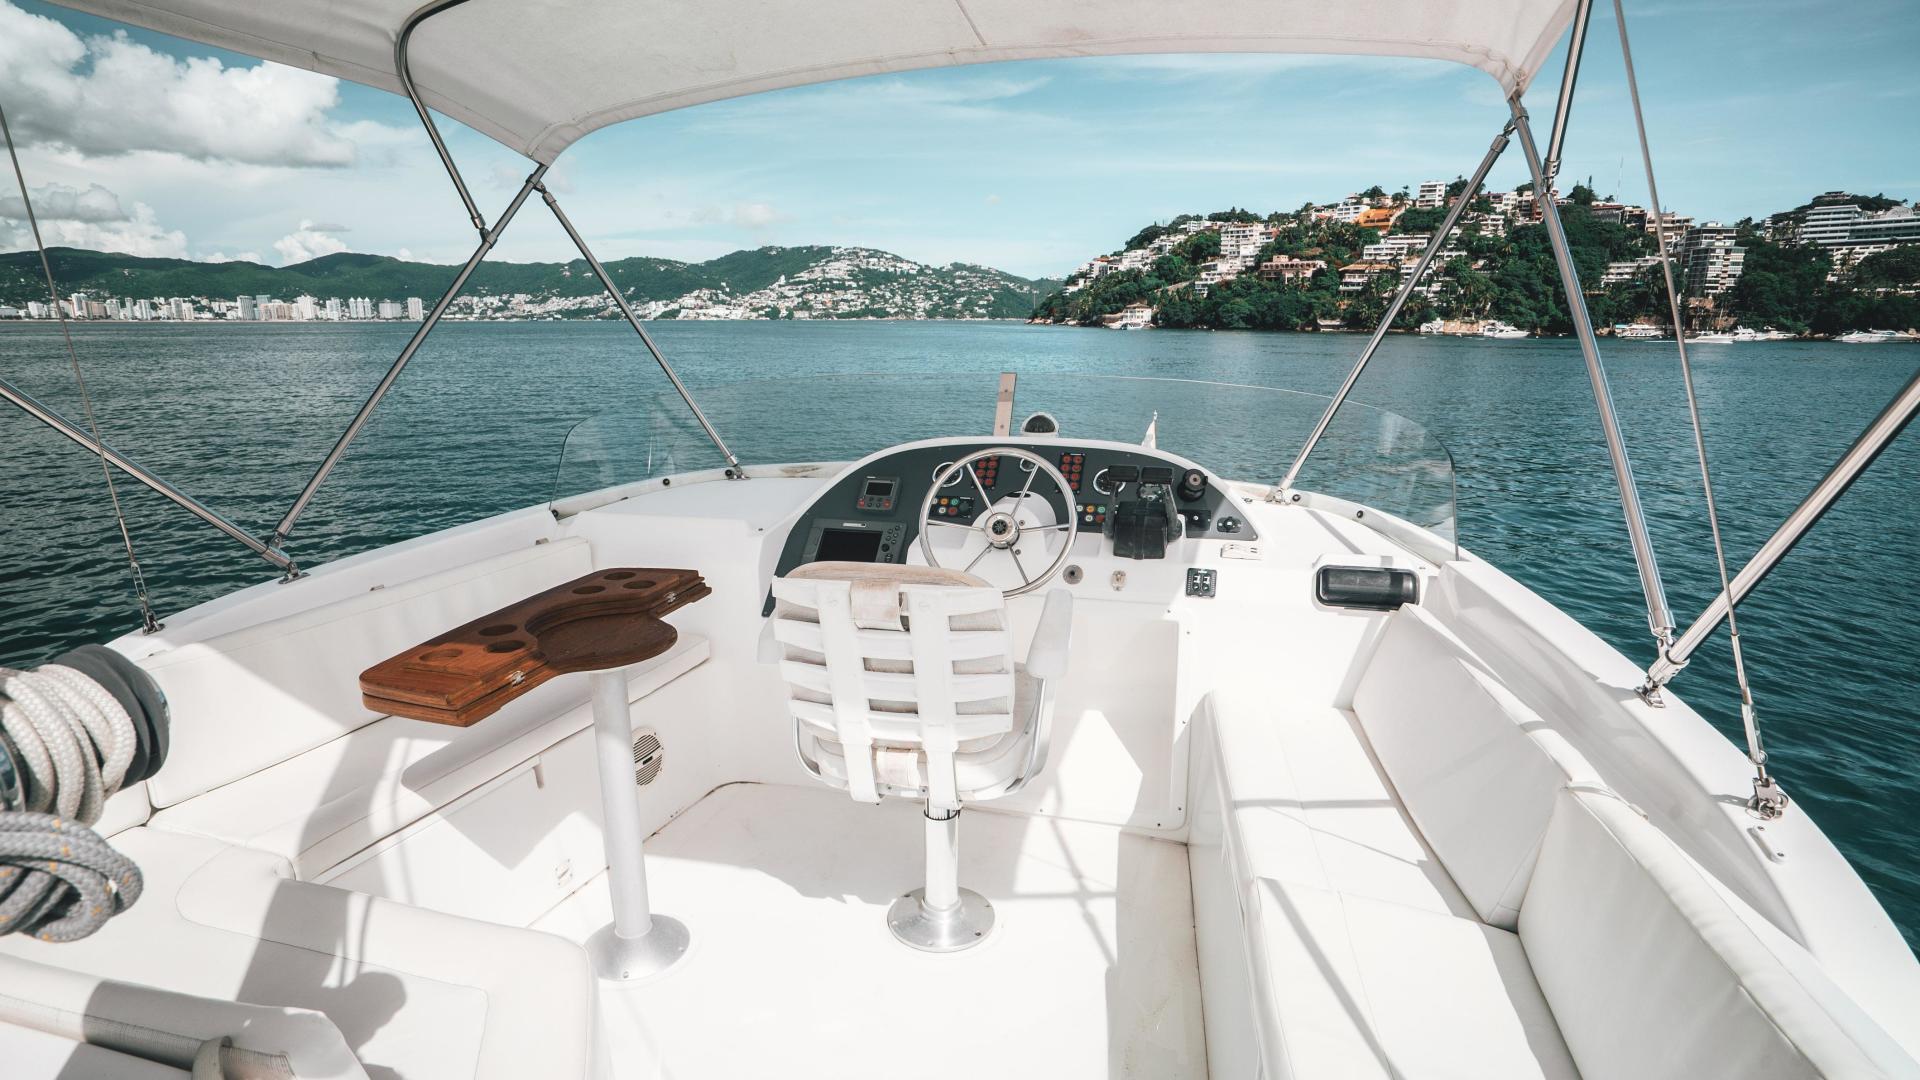 Beneteau-Swift Trawler 2008-Amadeus Acapulco-Mexico-1487040 | Thumbnail